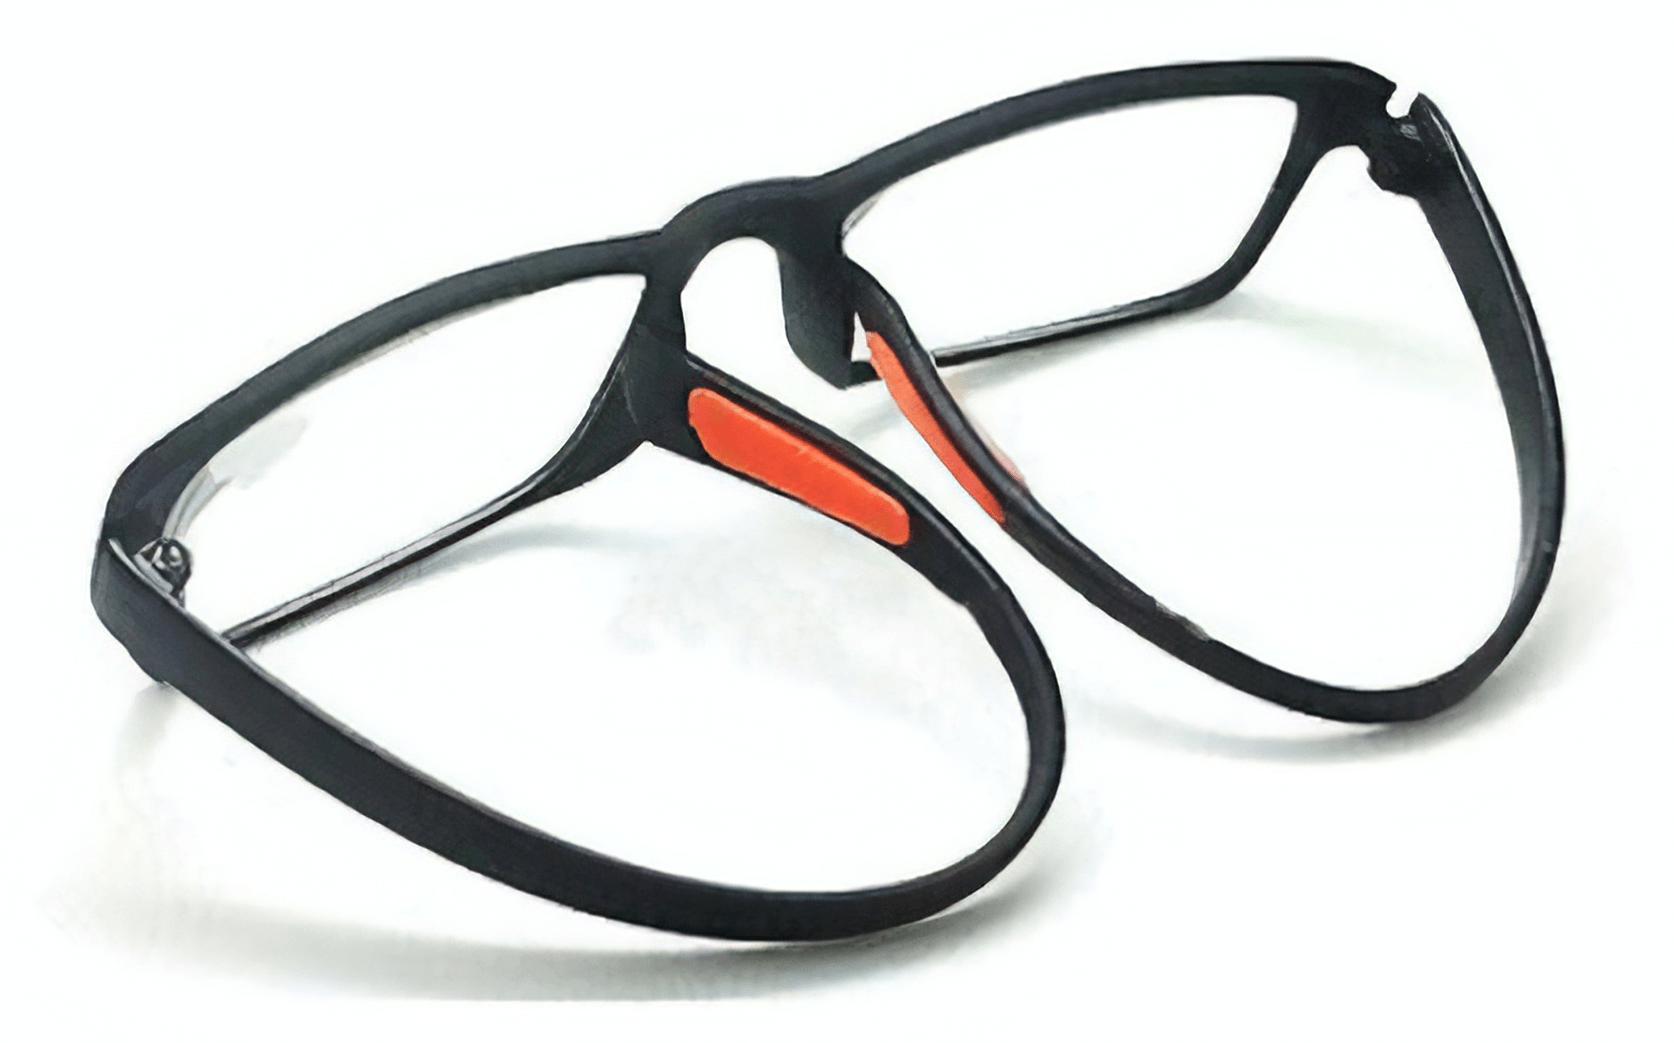 «Антивандальные» очки Unisex Reading Glasses, цена — 71 р.